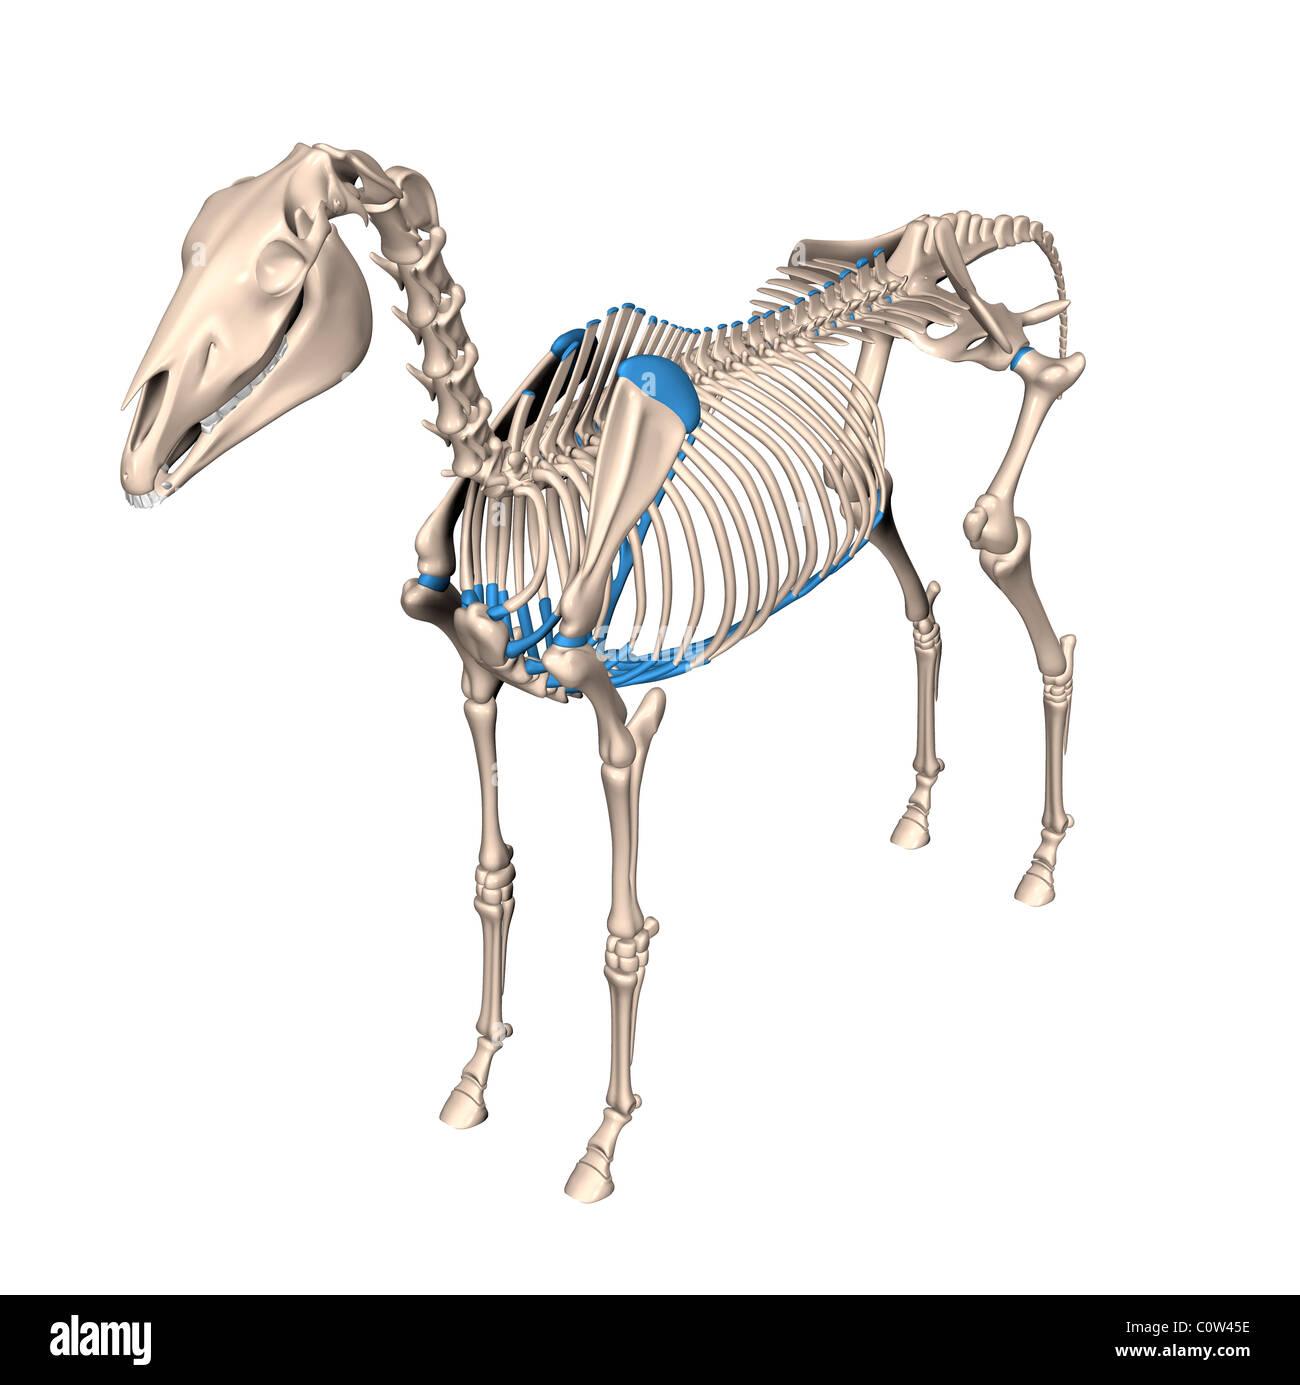 Anatomía del caballo esqueleto Foto & Imagen De Stock: 34972826 - Alamy